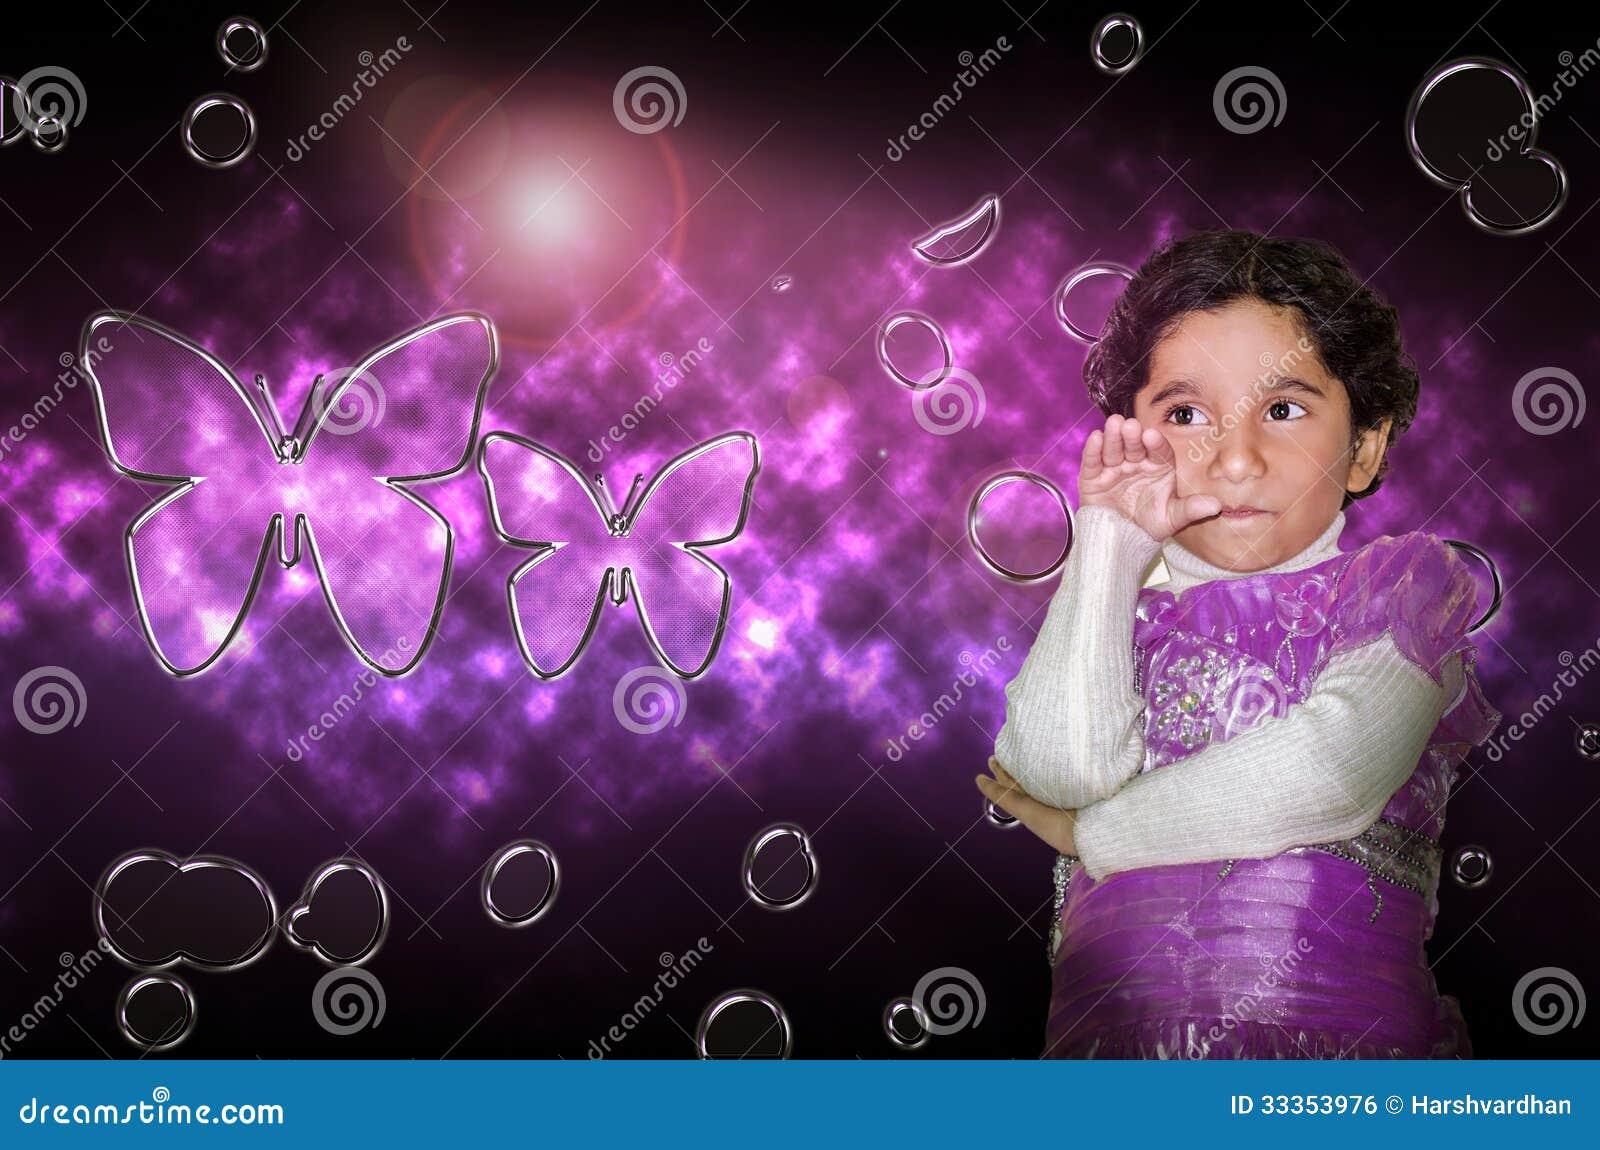 Purple Baby Girl Background